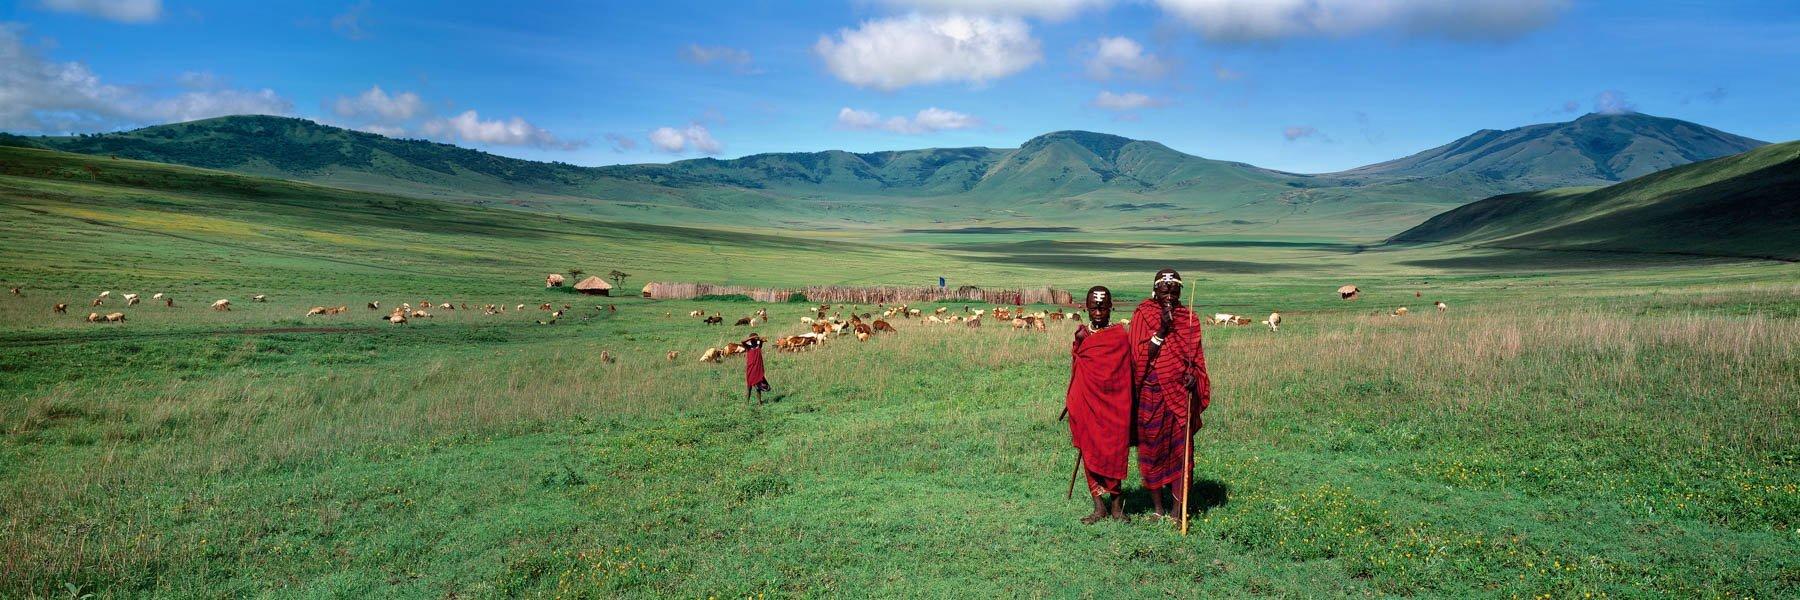 Young Masai tribesmen tending their catrtle, Ngorongoro Crater, Tanzania, Africa.